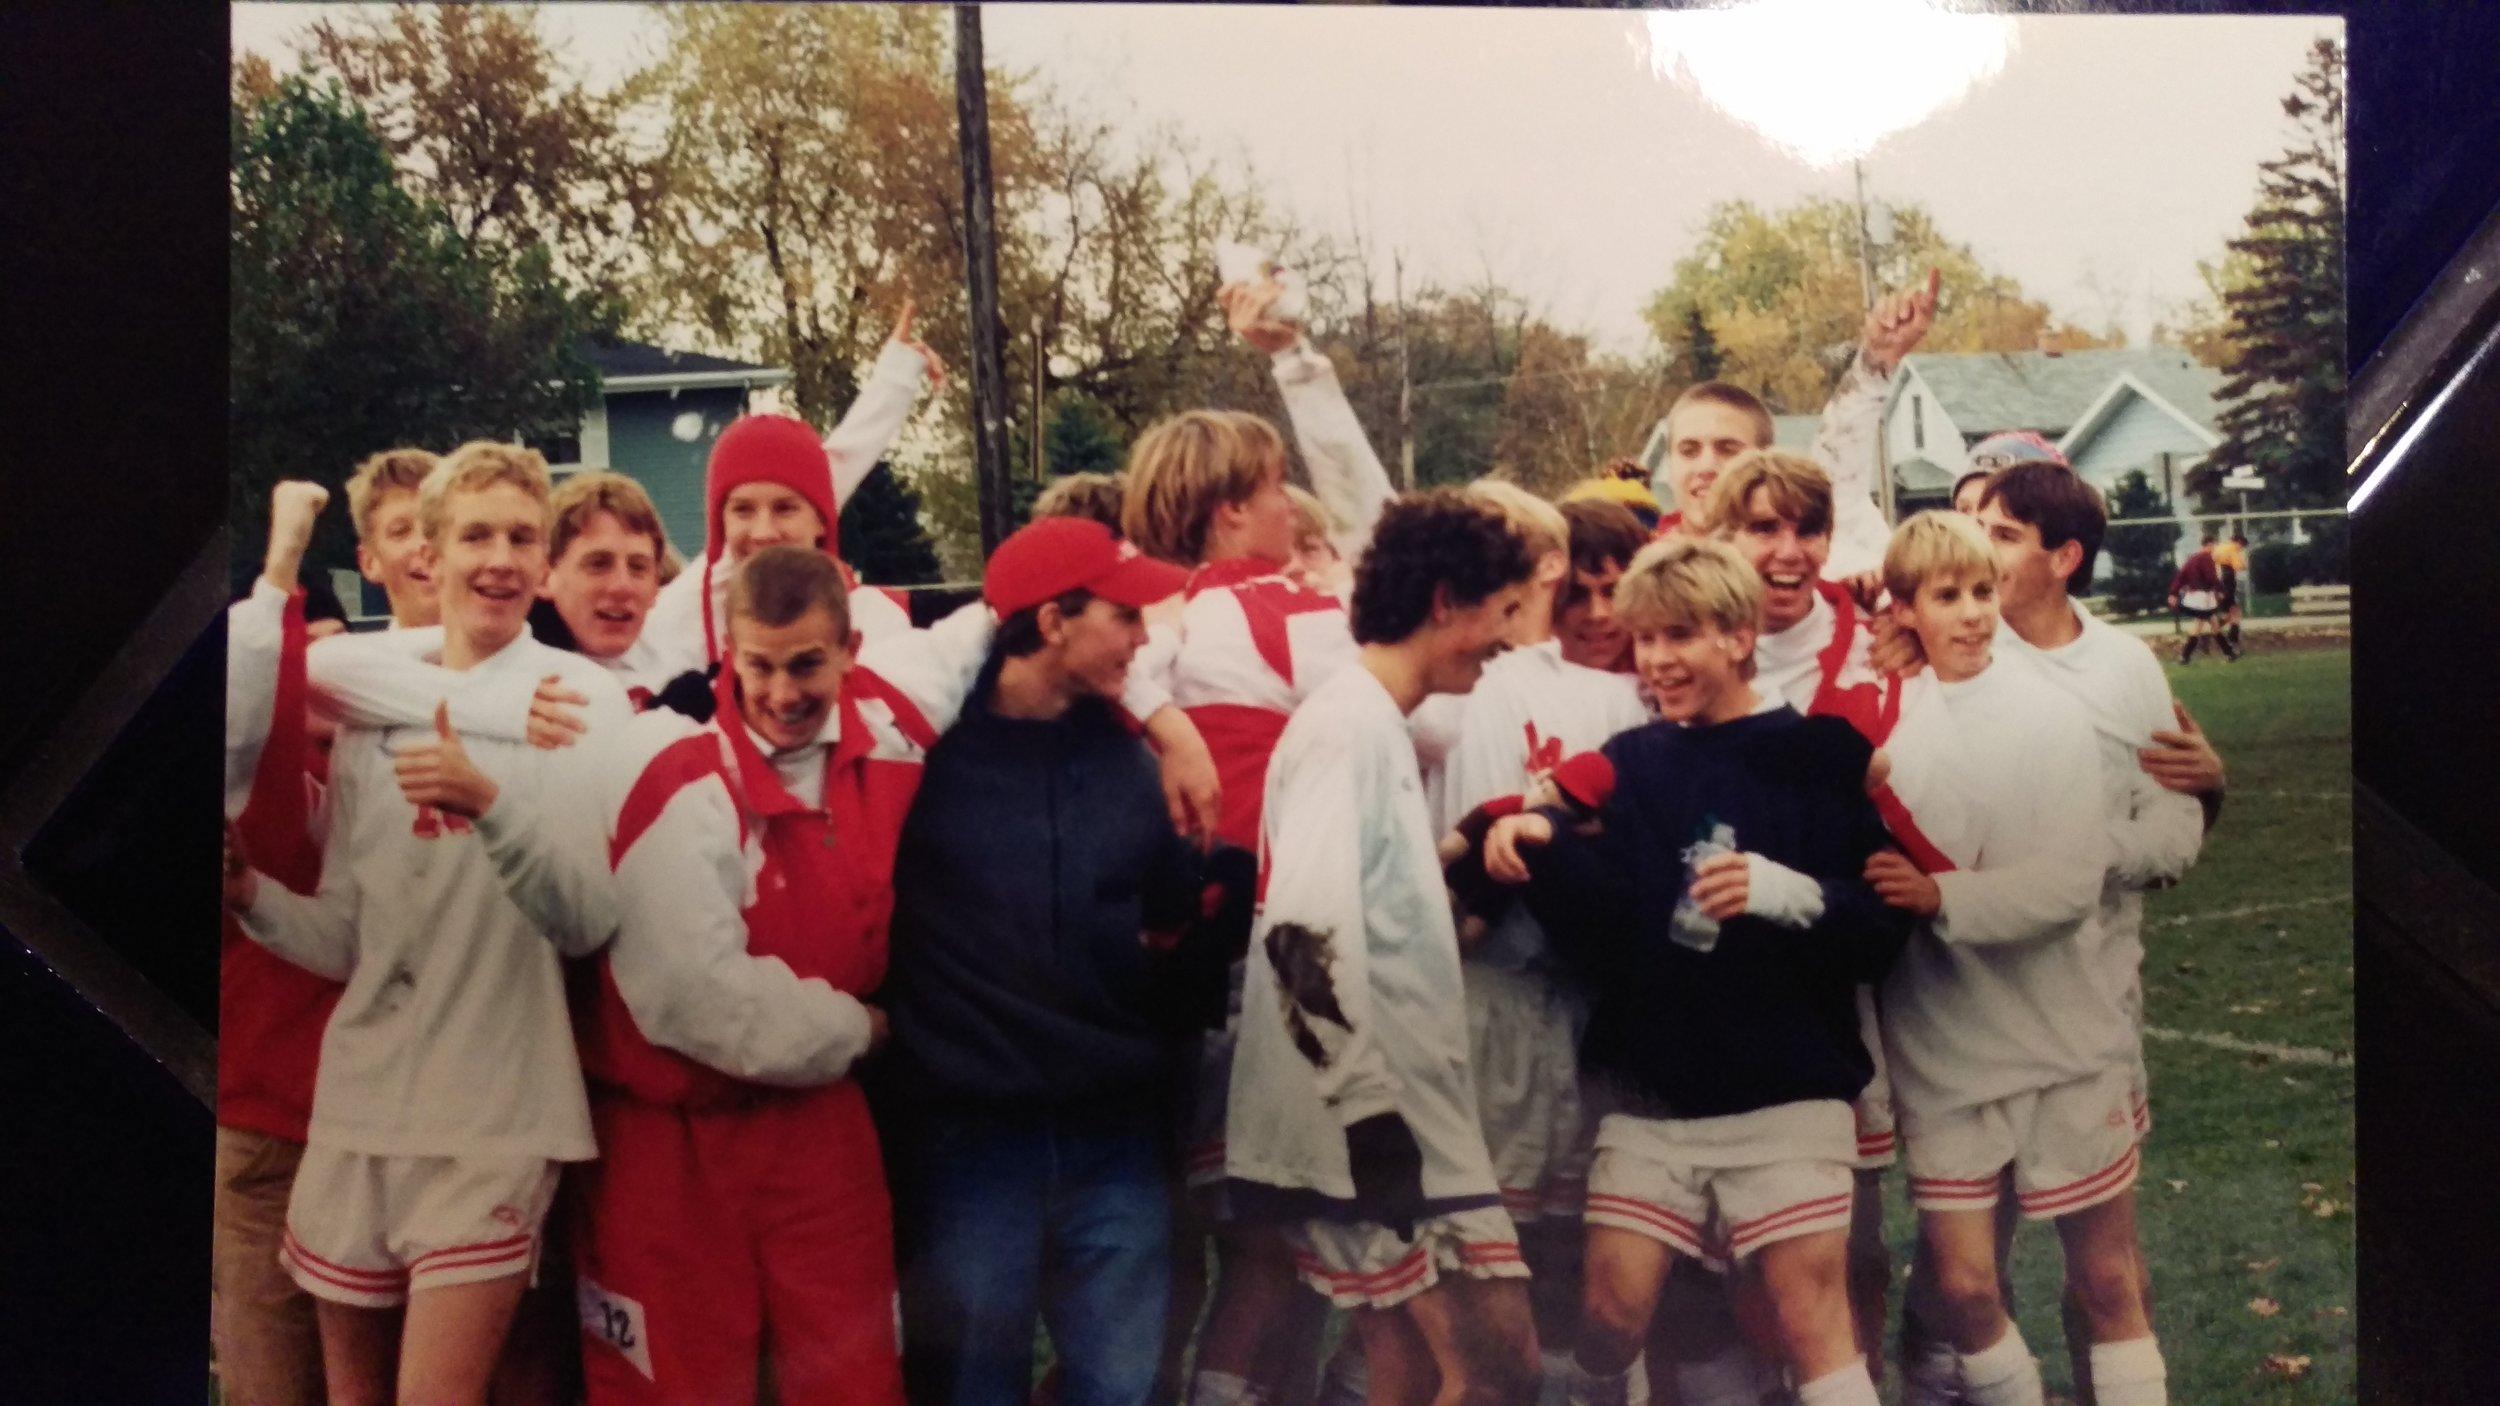 '95 Neenah Soccer State Bound... No pressure, just a blast!